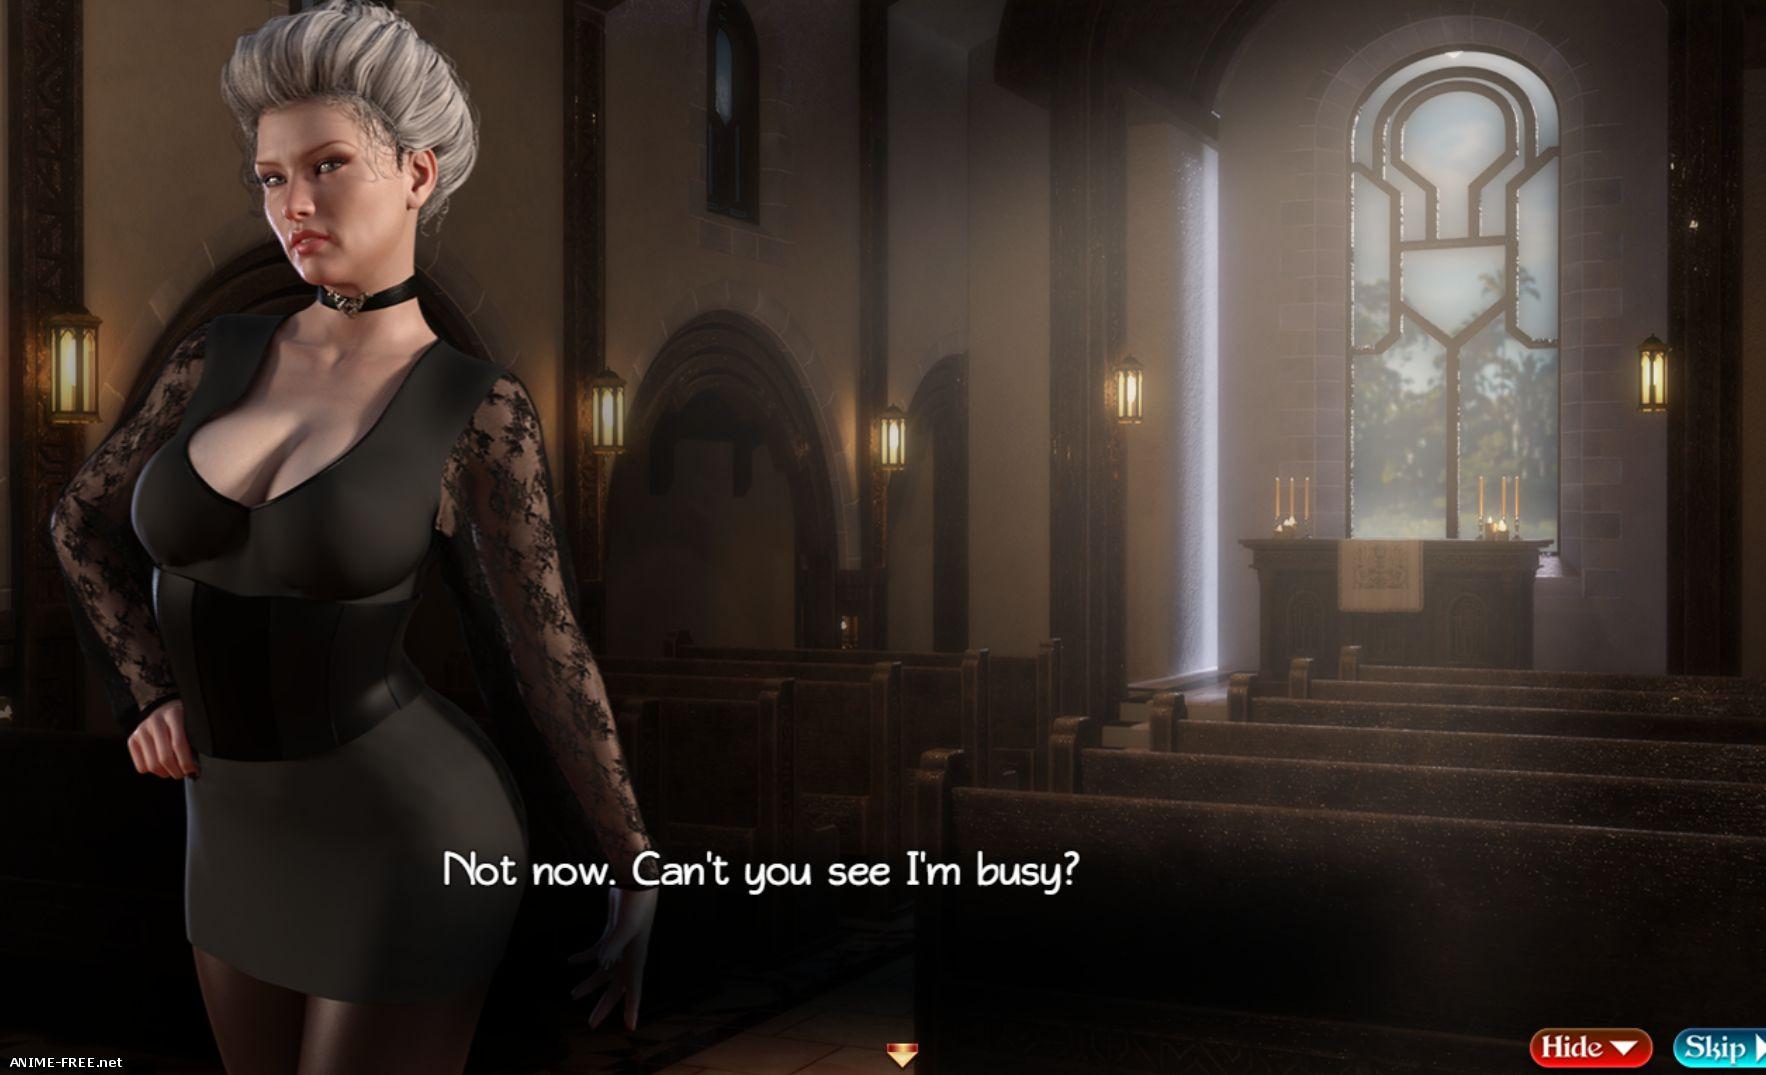 Treasure of Nadia [2019] [Uncen] [ADV, 3DCG, Animation] [ENG,RUS] H-Game